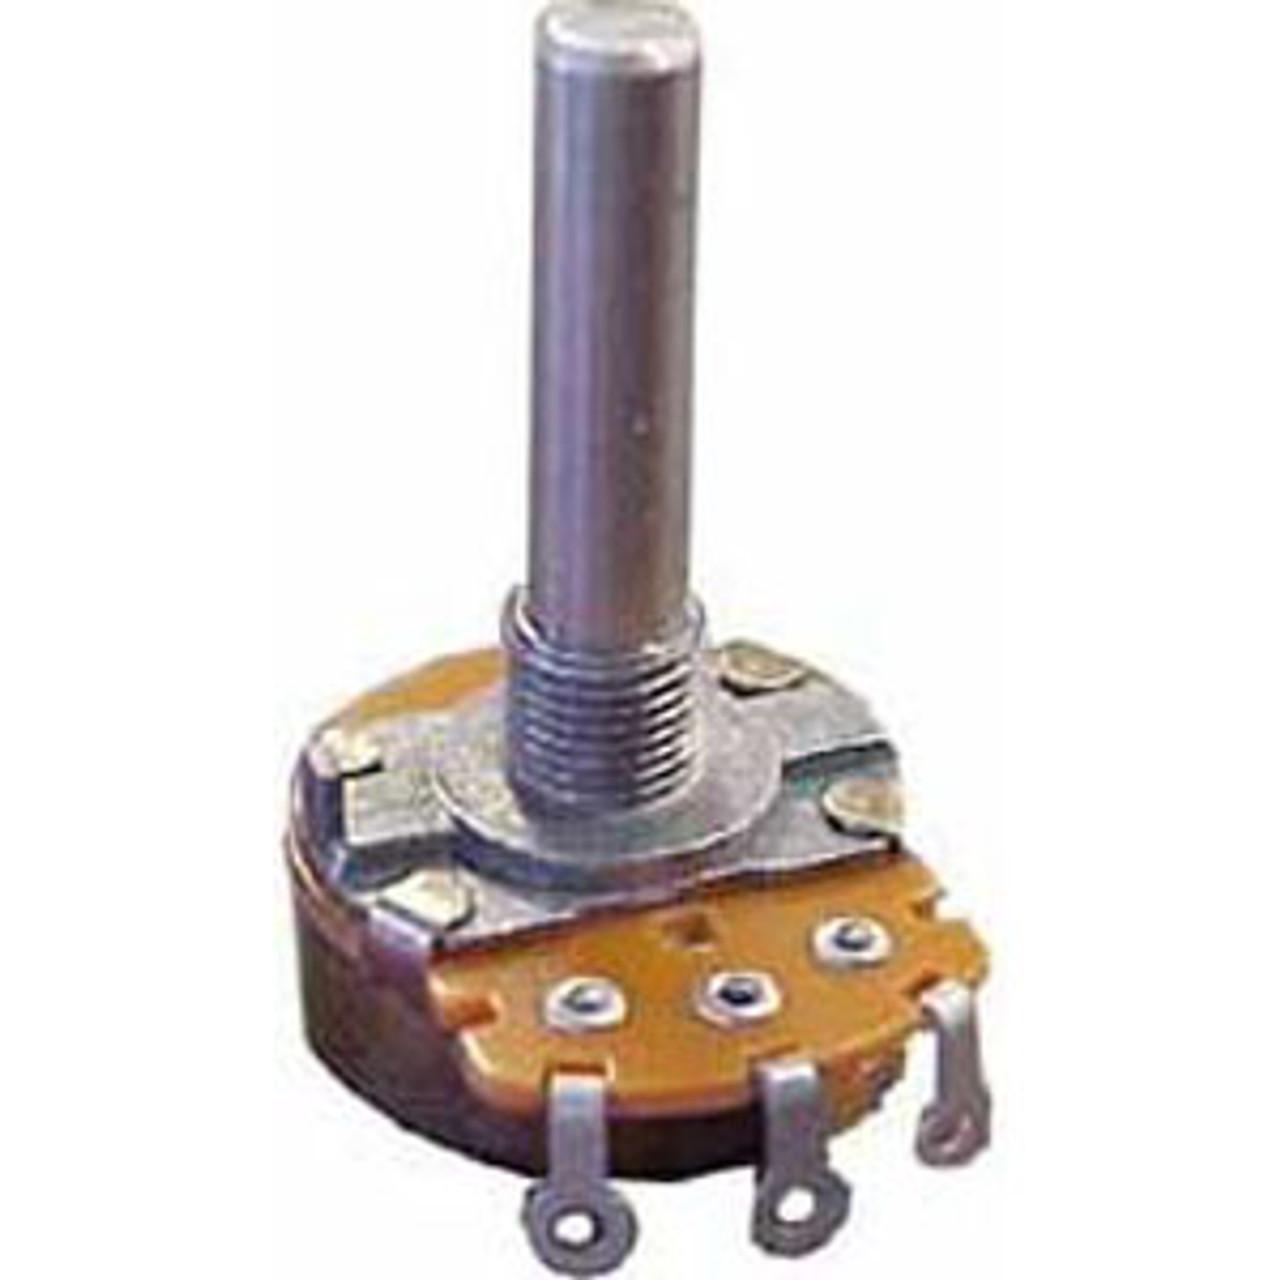 5K Potentiometer (16 mm) Linear taper without switch Solder lug terminals Max voltage: 150 VAC Audio 200 VAC Power rating: Linear 200mA, .2W Audio 100 mA, .1W Bushing diameter 7 mm Shaft 30mm w/flat 12mm, 6mm OD